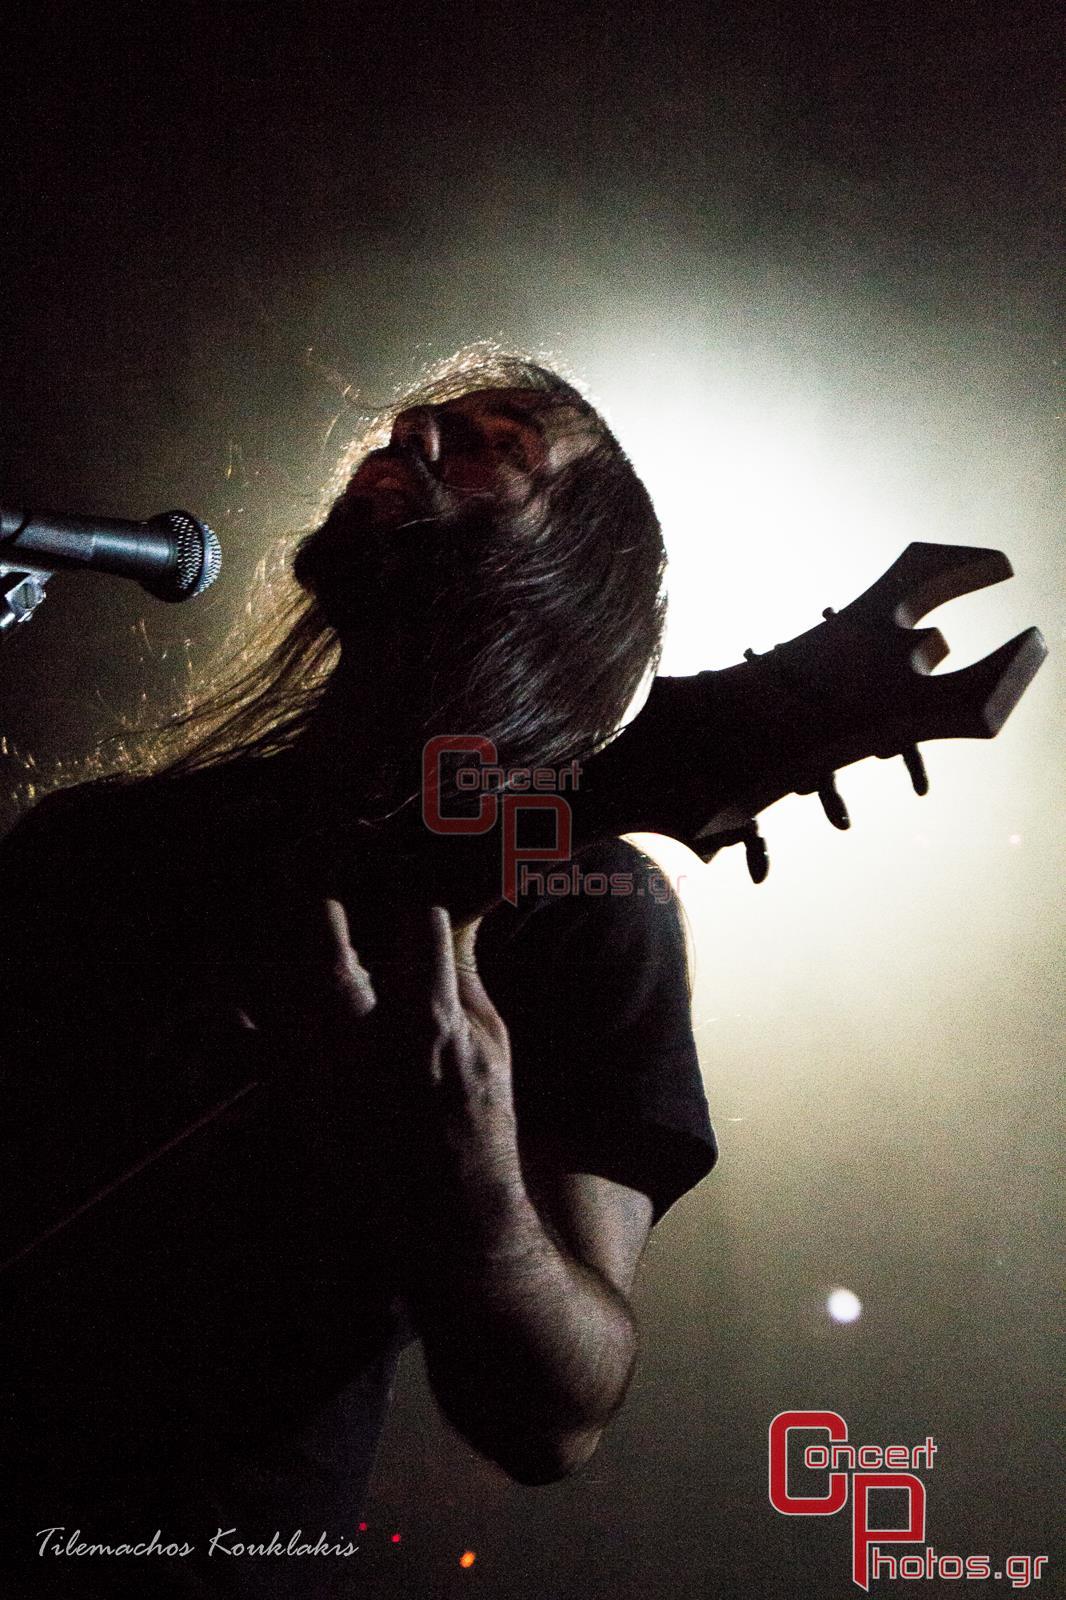 Rotting Christ-Rotting Christ photographer:  - ConcertPhotos-5151